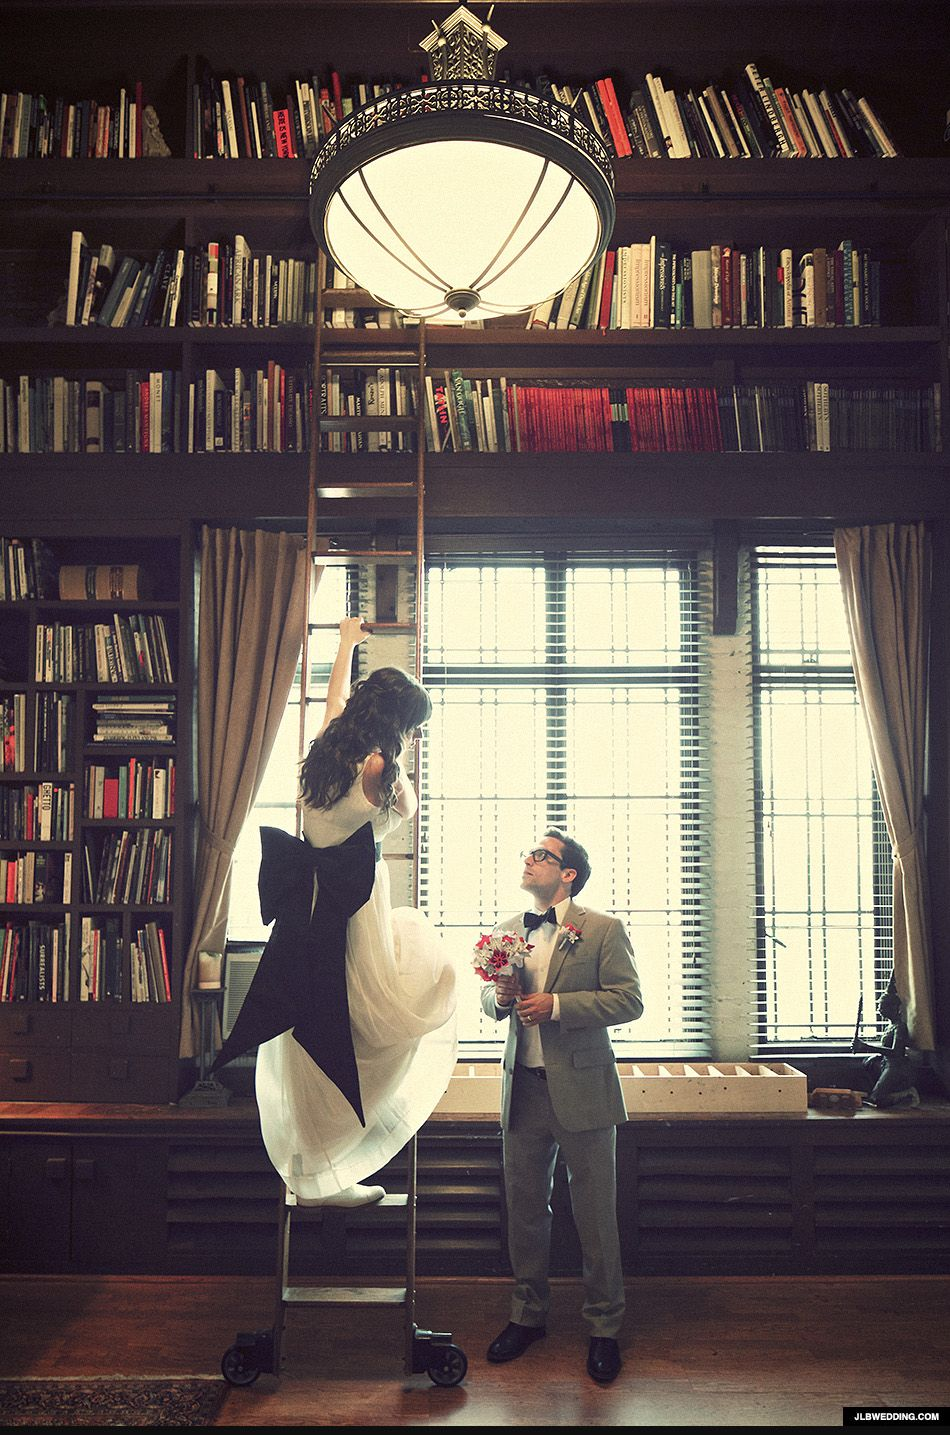 Pin By Emma Nelson On Weddings Literary Wedding Book Themed Wedding Wedding Photos